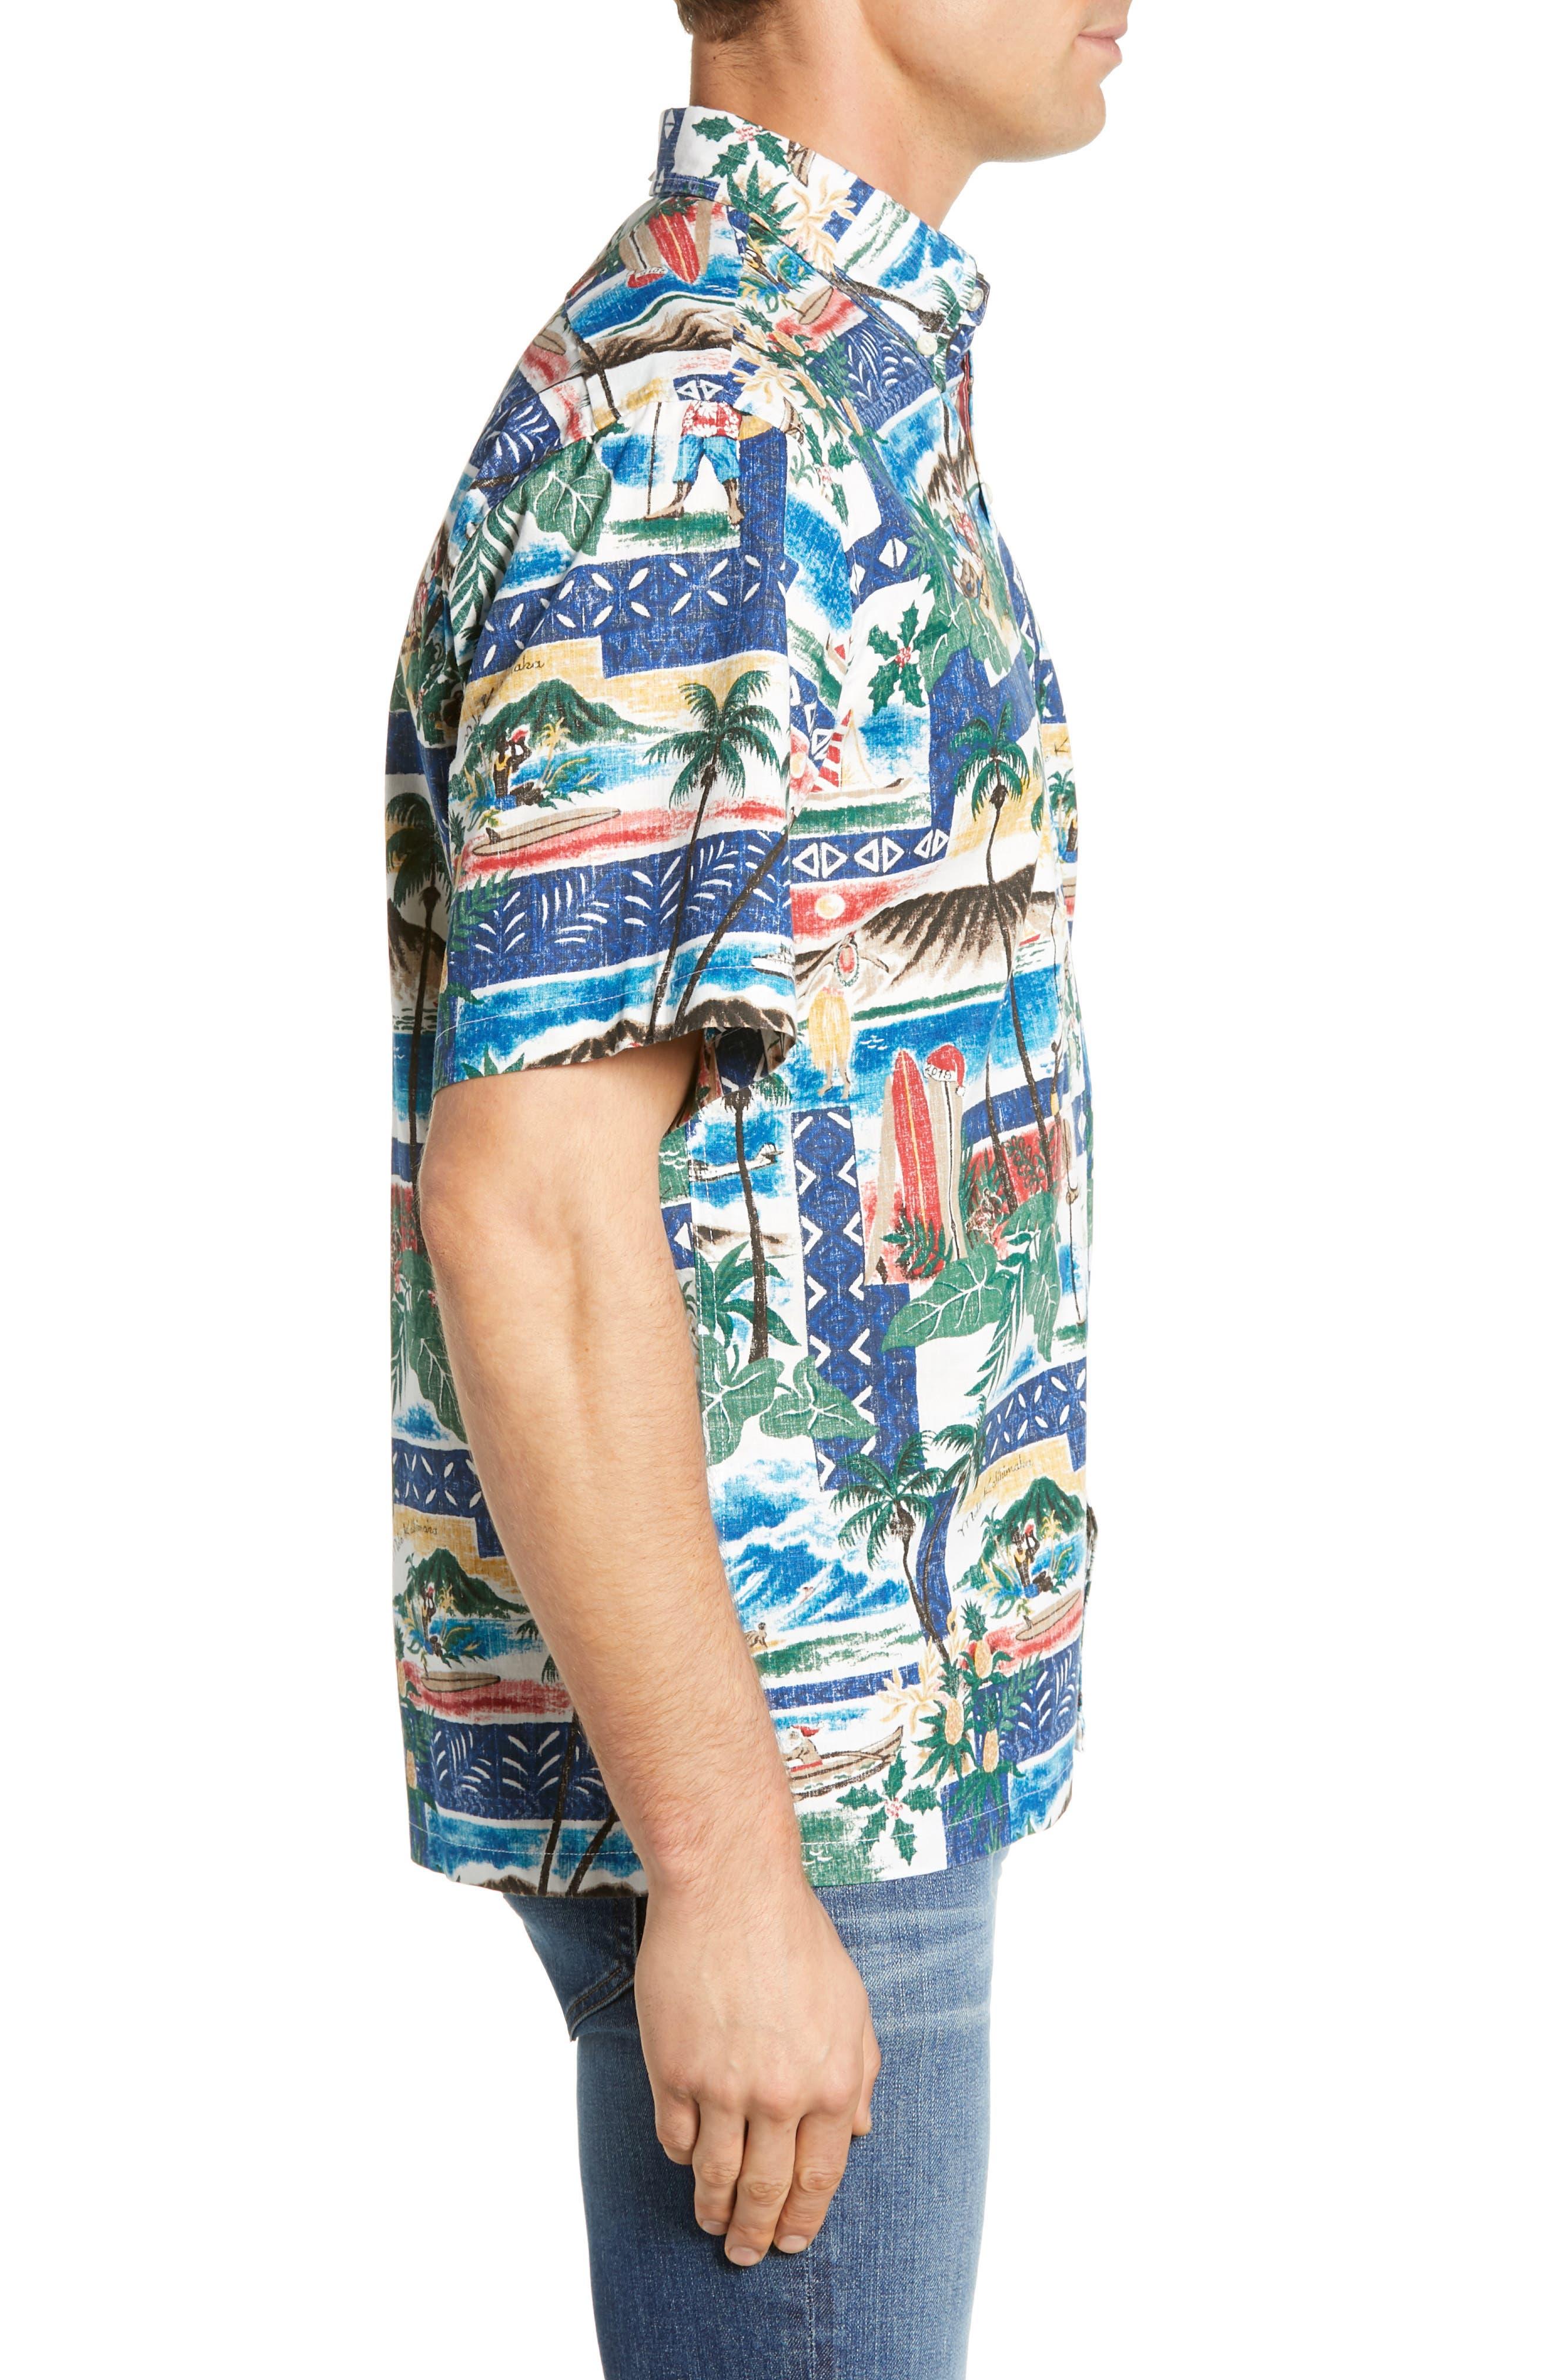 REYN SPOONER, Hawaiian Christmas 2018 Classic Fit Sport Shirt, Alternate thumbnail 4, color, 420